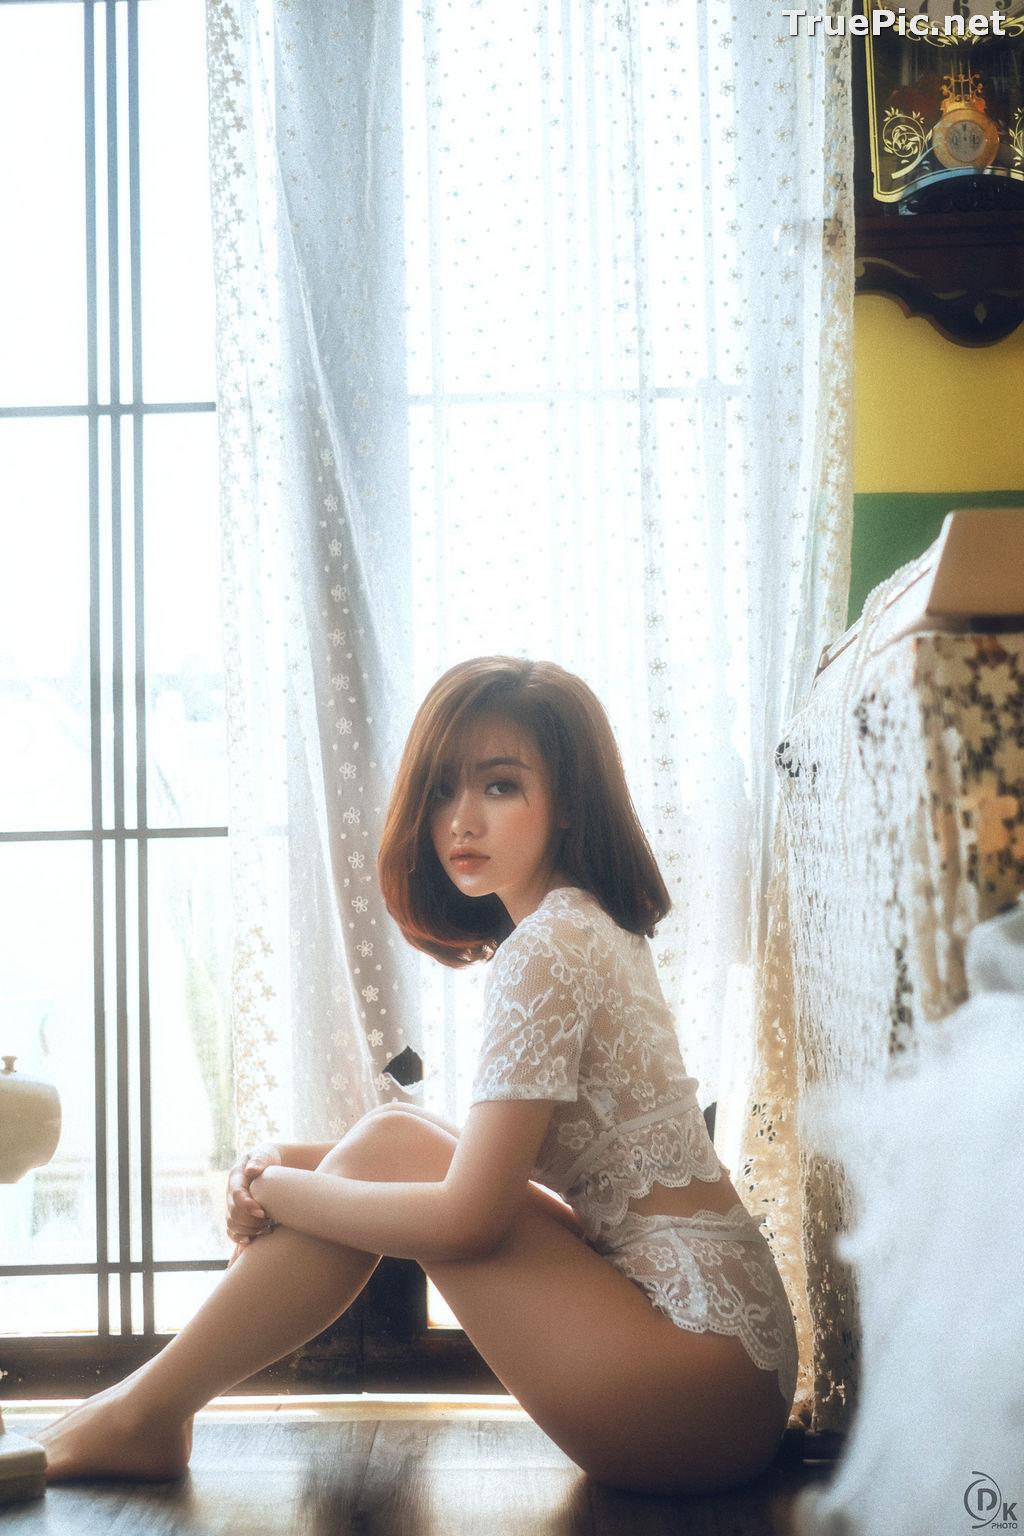 Image Vietnamese Hot Model - Sleepwear and Lingerie Under Dawnlight - TruePic.net - Picture-6